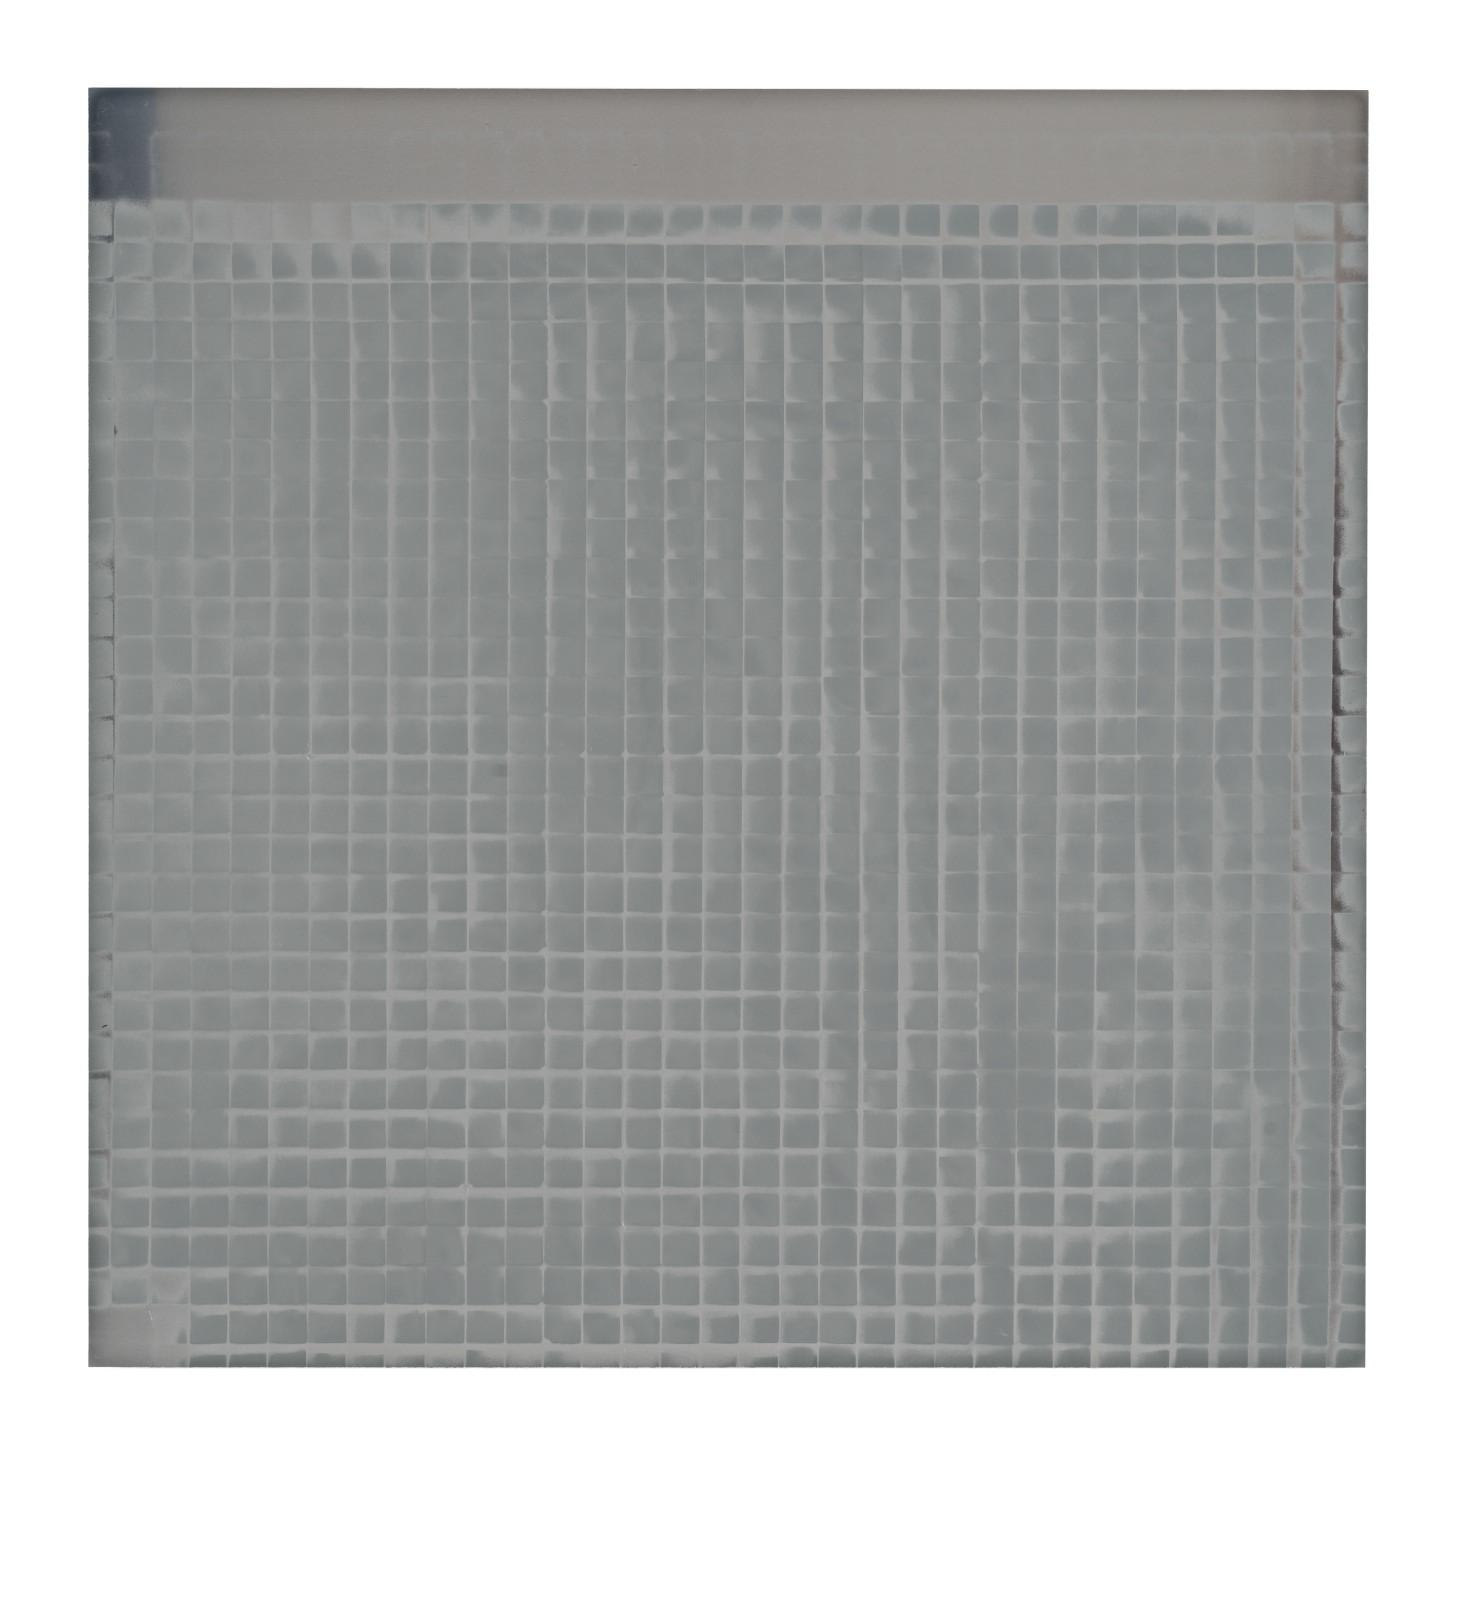 "STAIN : 55°42'24.4""N 13°11'29.3""E, 2016, spraypaint on aluminium, 81,3 x 81,3 cm"